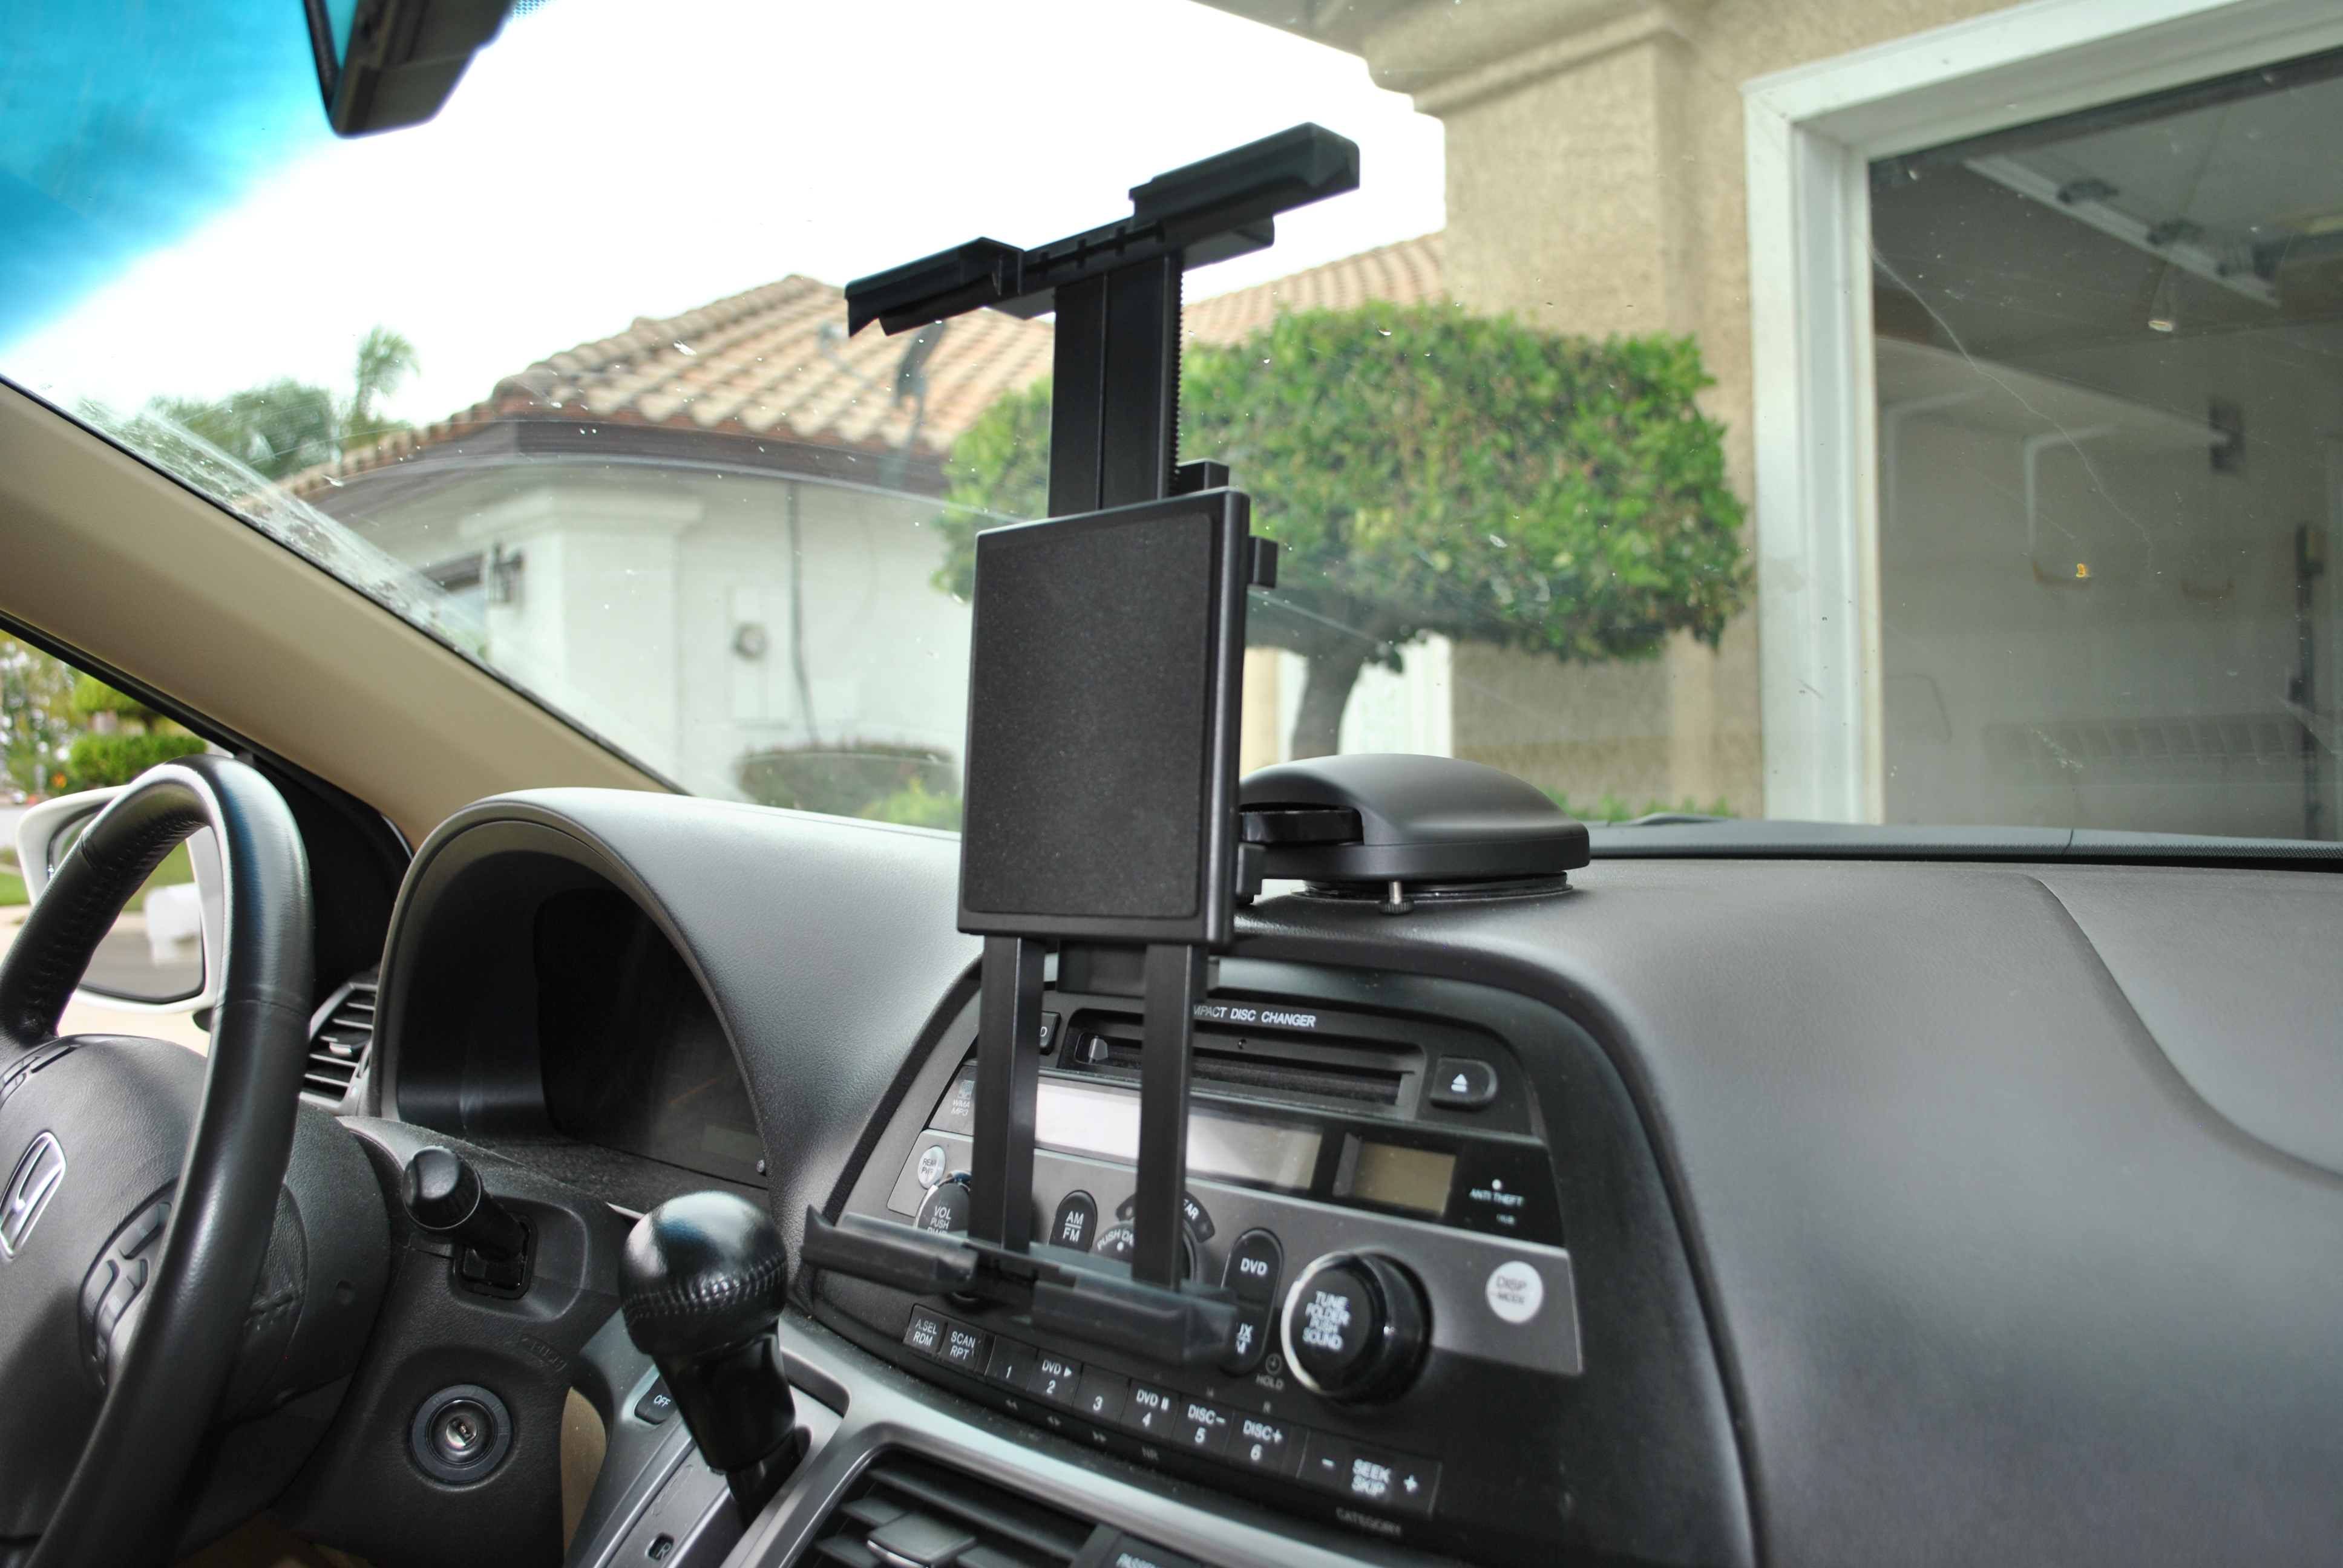 tablet smart phone mount holder for ipad galaxy kindle nexus ebay